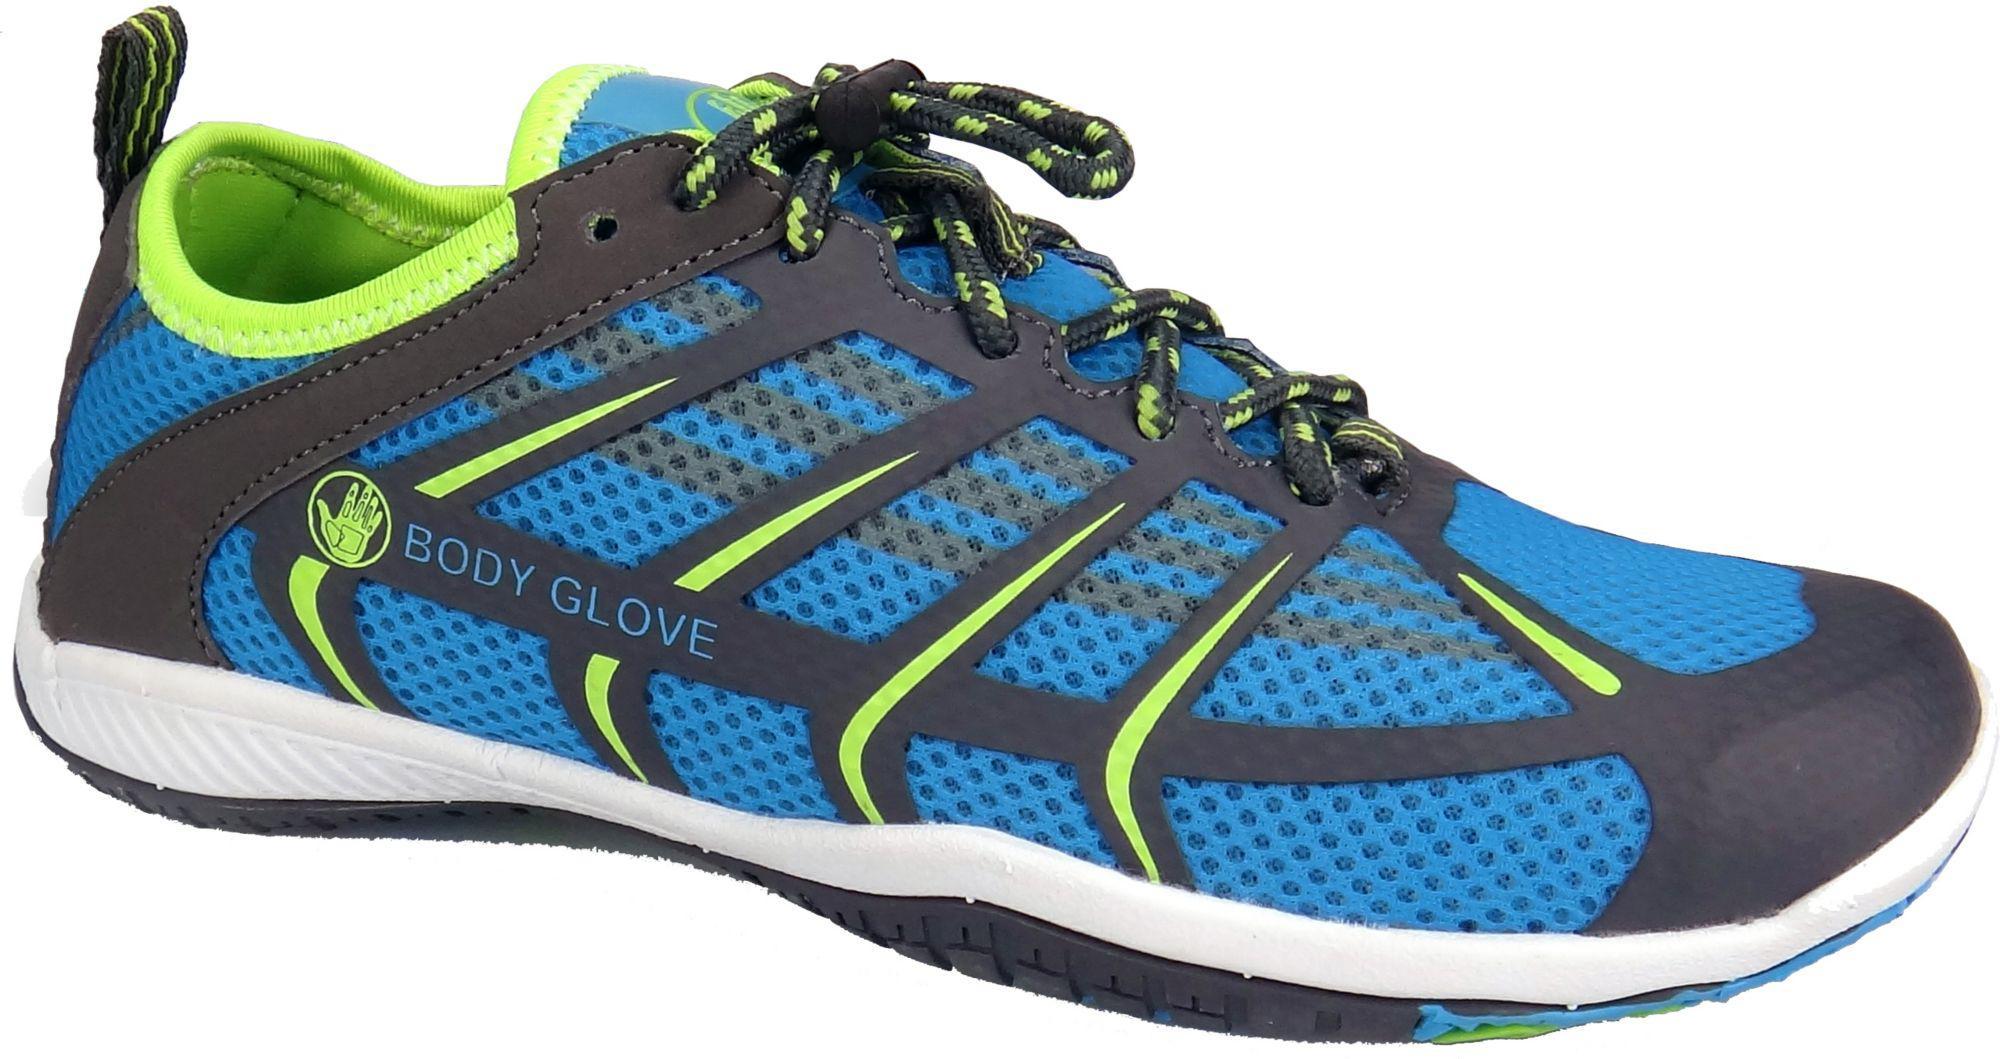 ebac66b5859c Lyst - Body Glove Dynamo Rapid Water Shoes in Blue